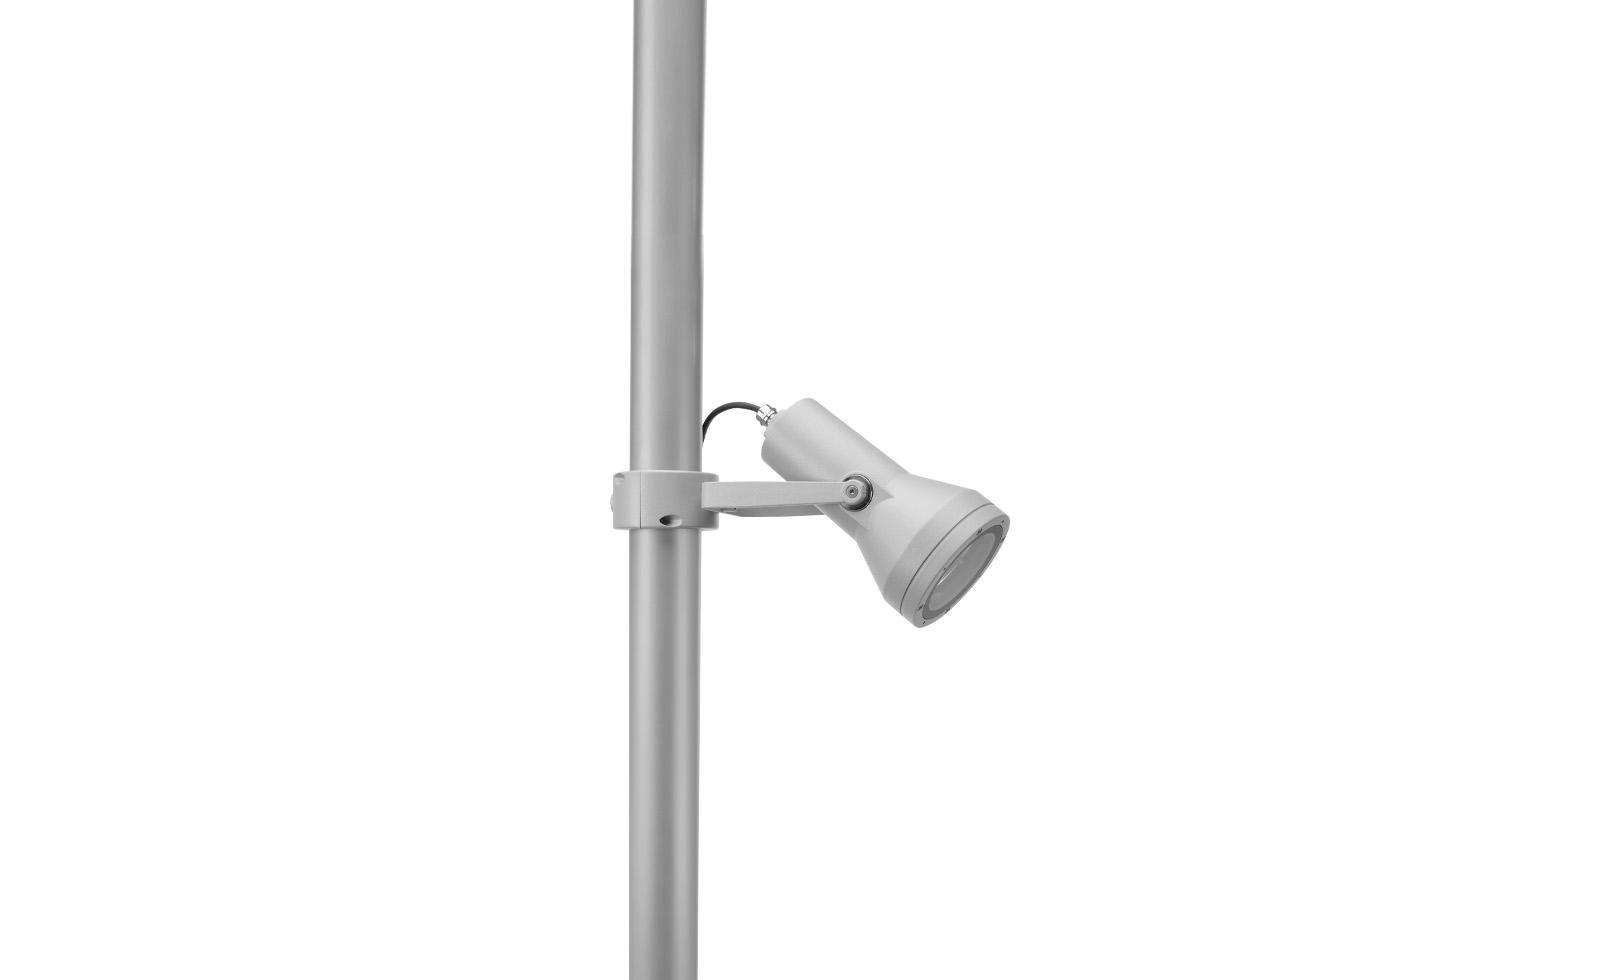 805001-805005 FLASH POLE MEDIUM LED 8W 2